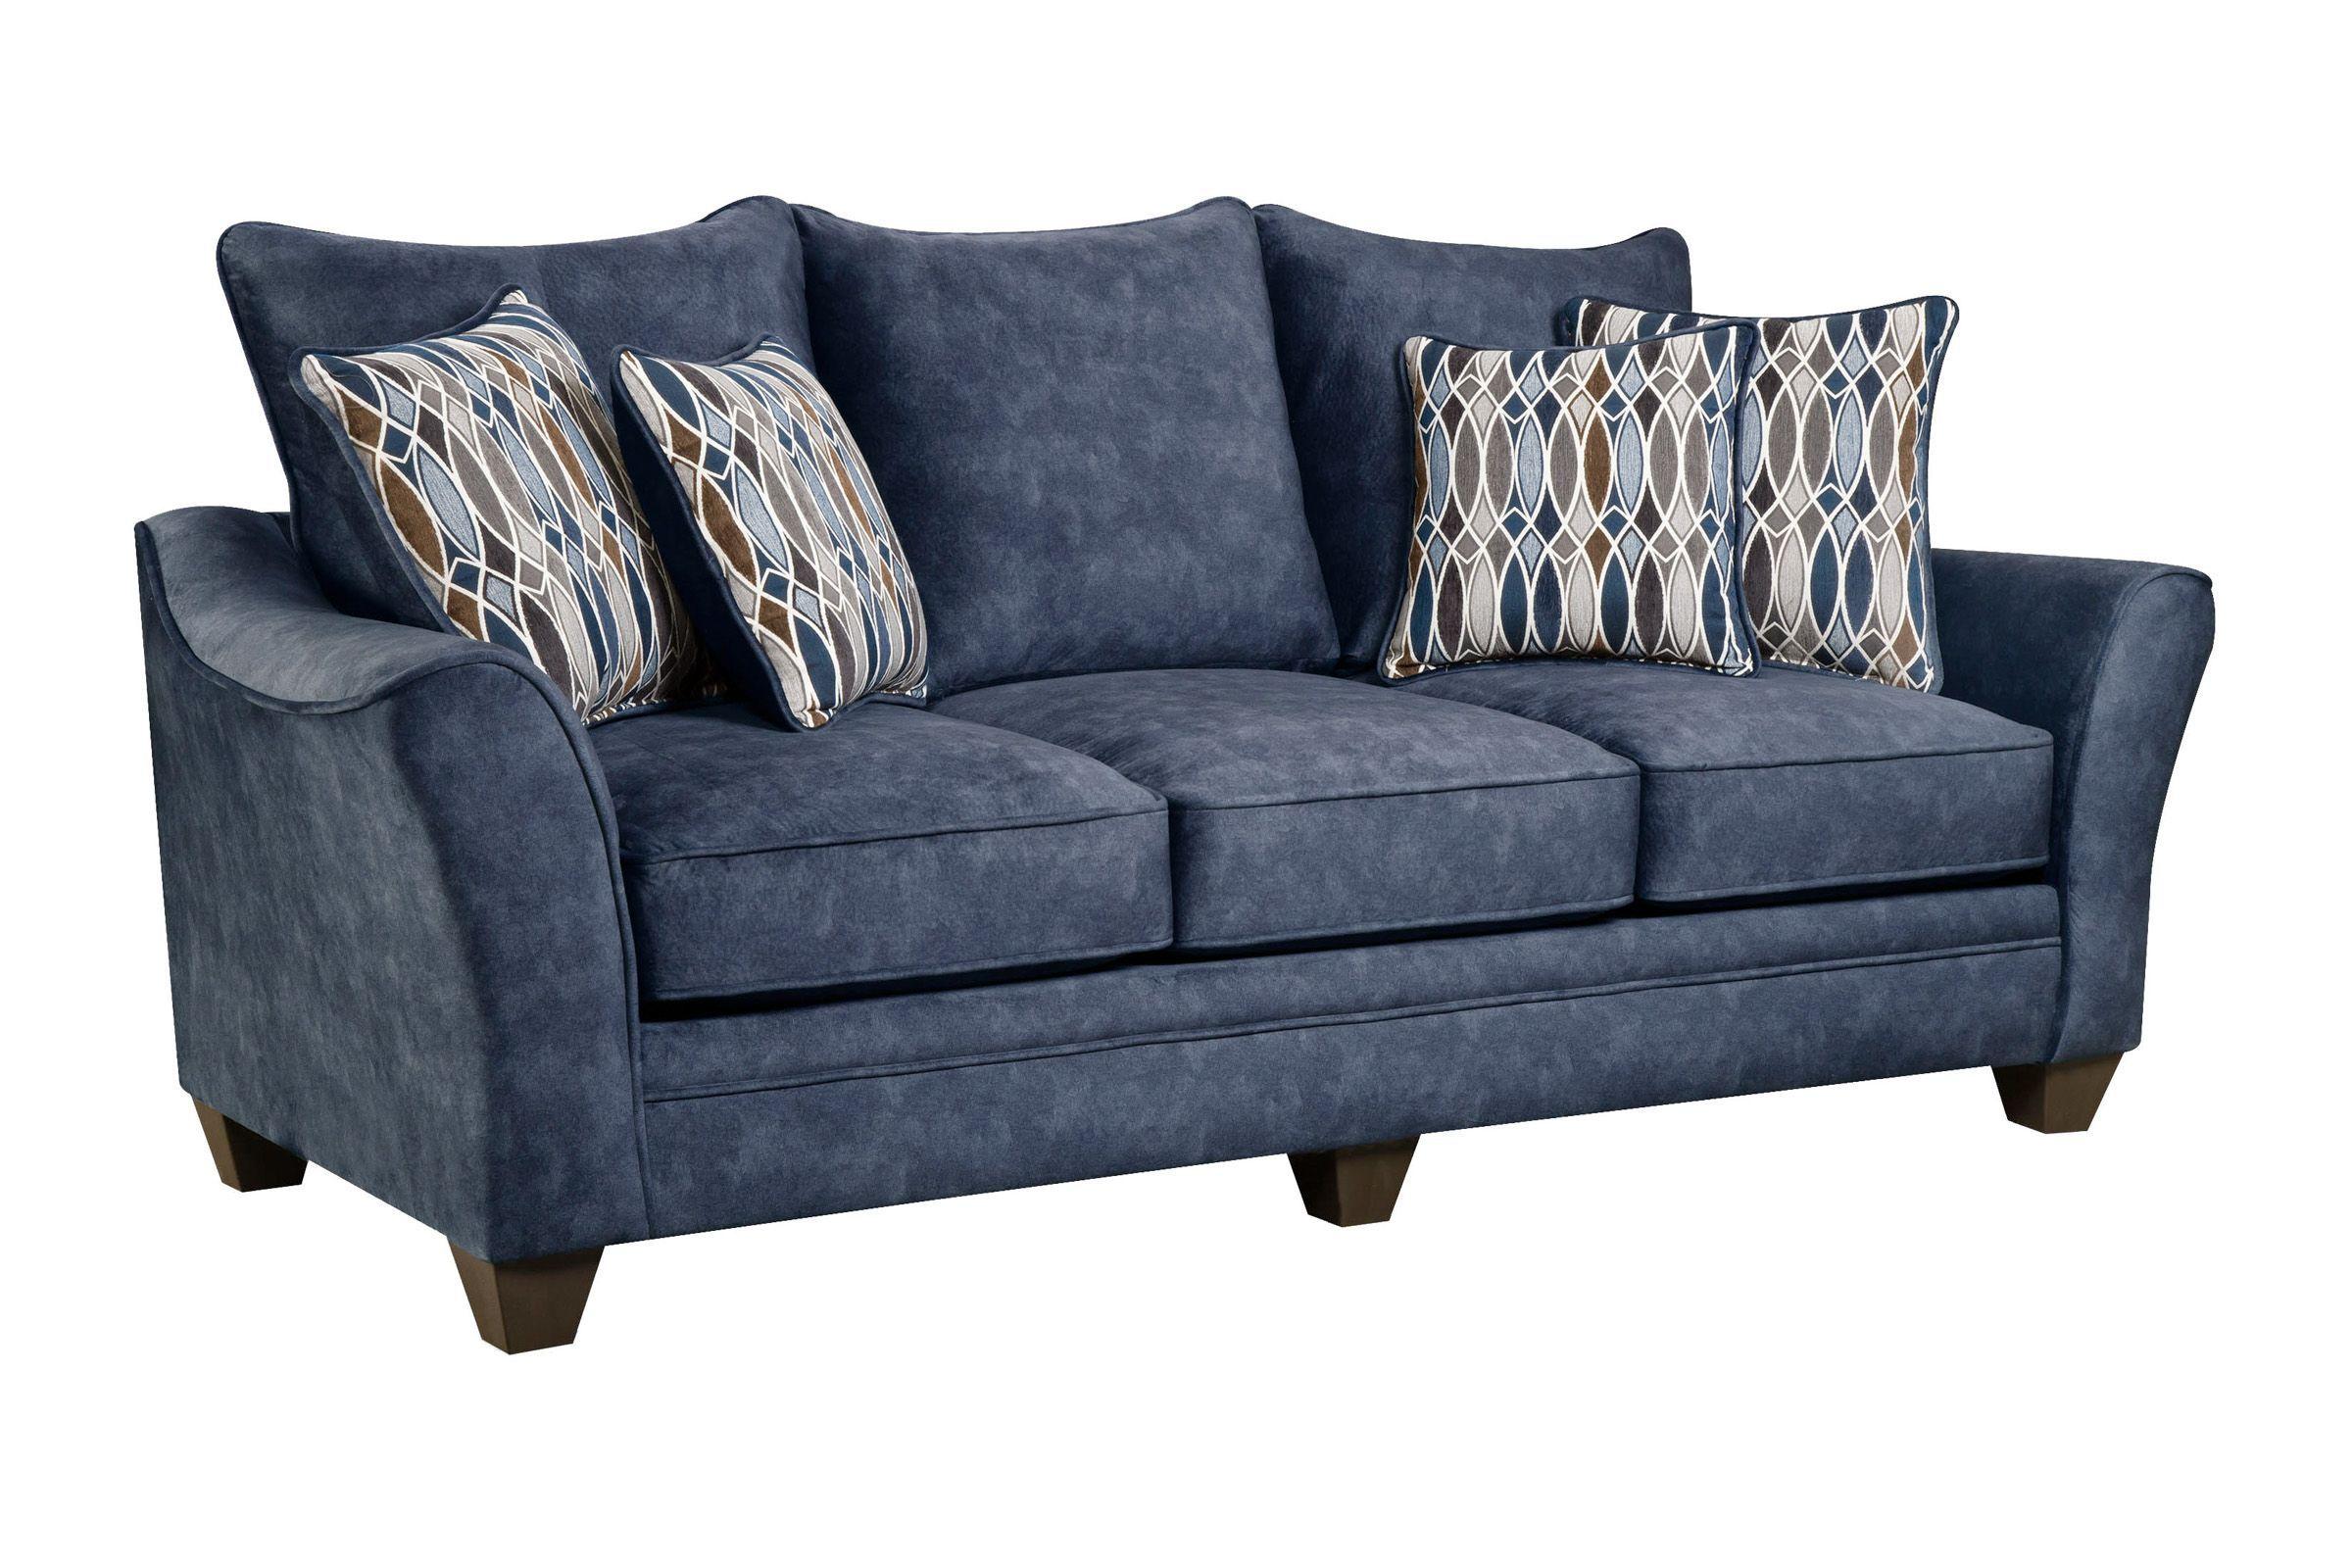 Neece Sofa in 2019 | Products | Sofa, Navy sofa, Gray sofa